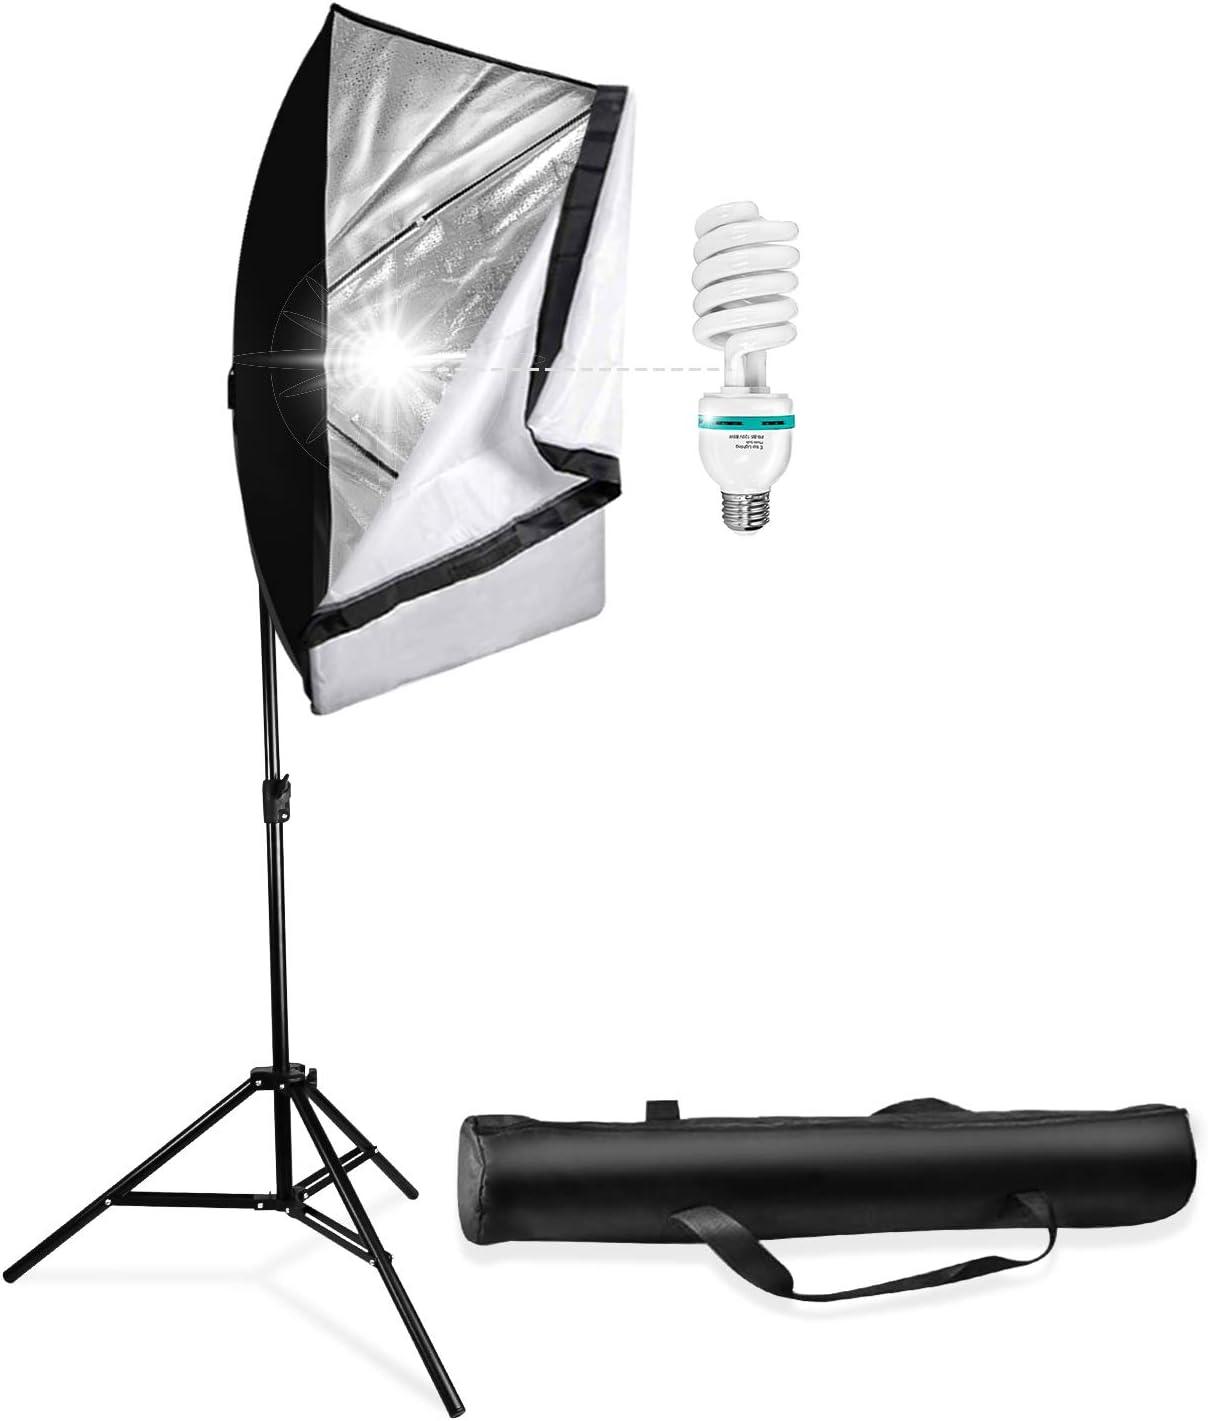 Light Holder AGG3100 Photo Portrait Shooting Daylight 78 Light Stand 6500K Lighting Bulb LS LIMO STUDIO LIMOSTUDIO 33 3-Fold Ultra Compack Lighting Flash Translucent White Soft Umbrella Kit